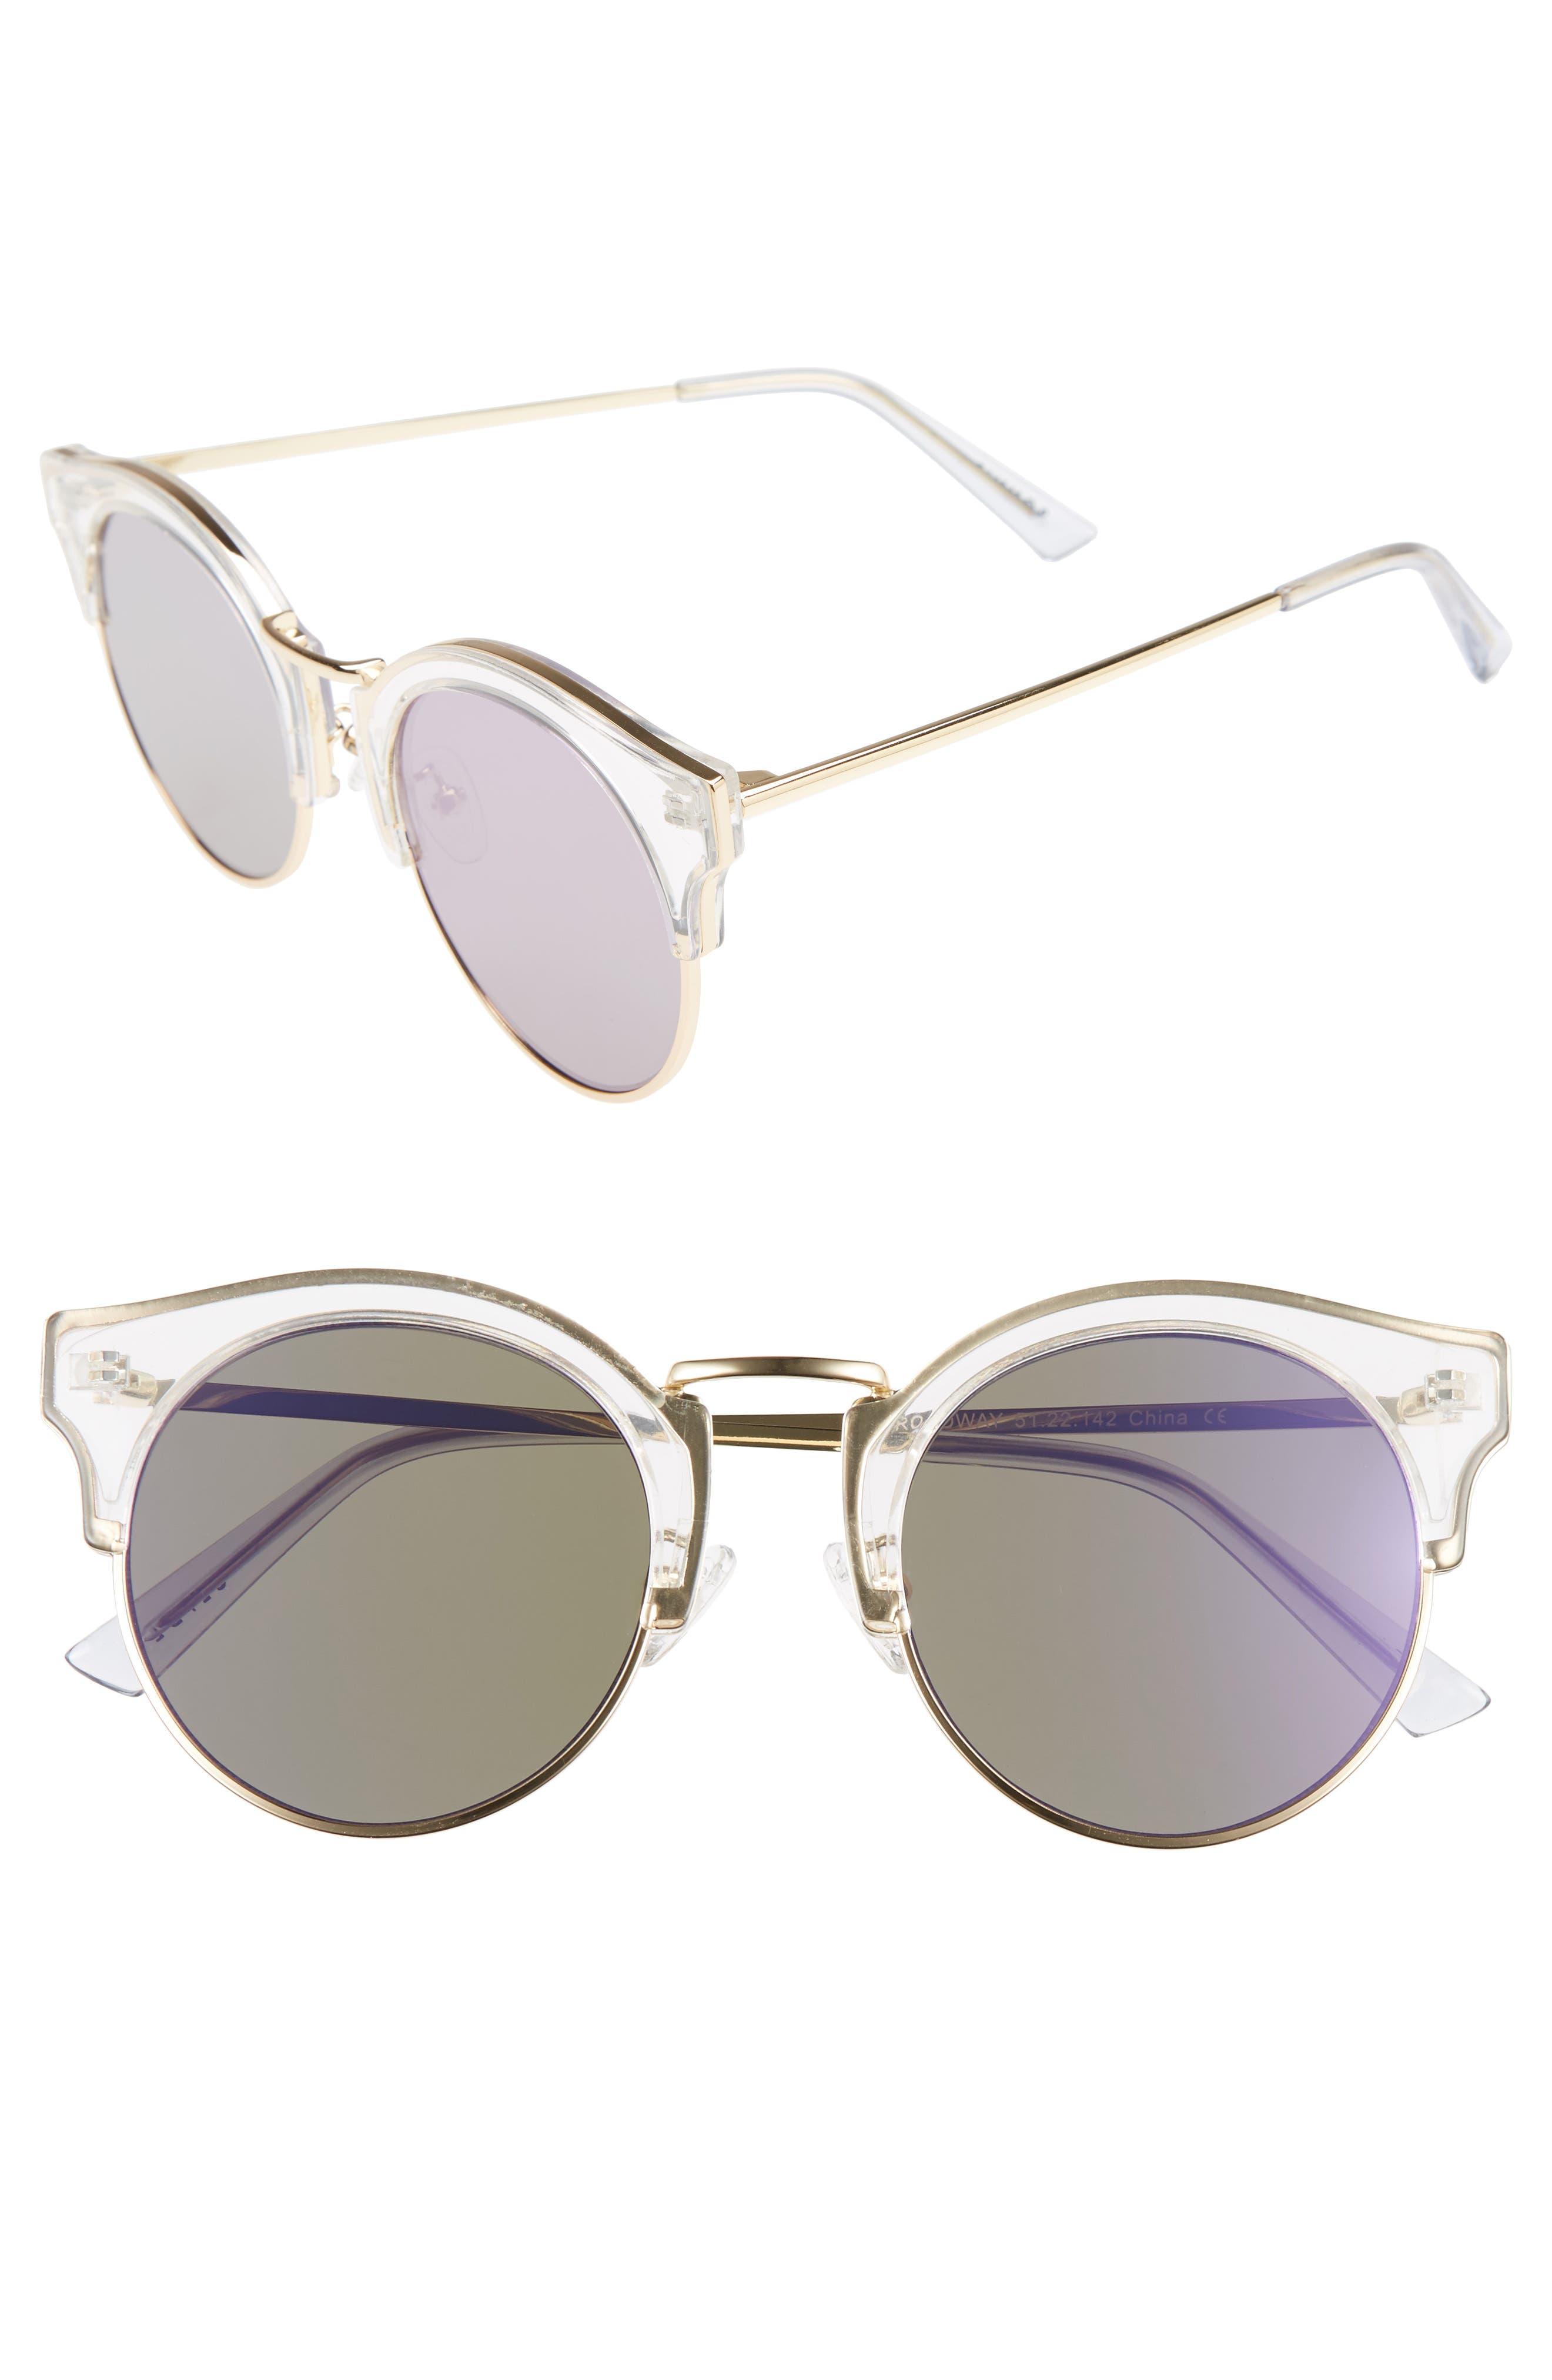 Broadway 51mm Retro Sunglasses,                             Main thumbnail 2, color,